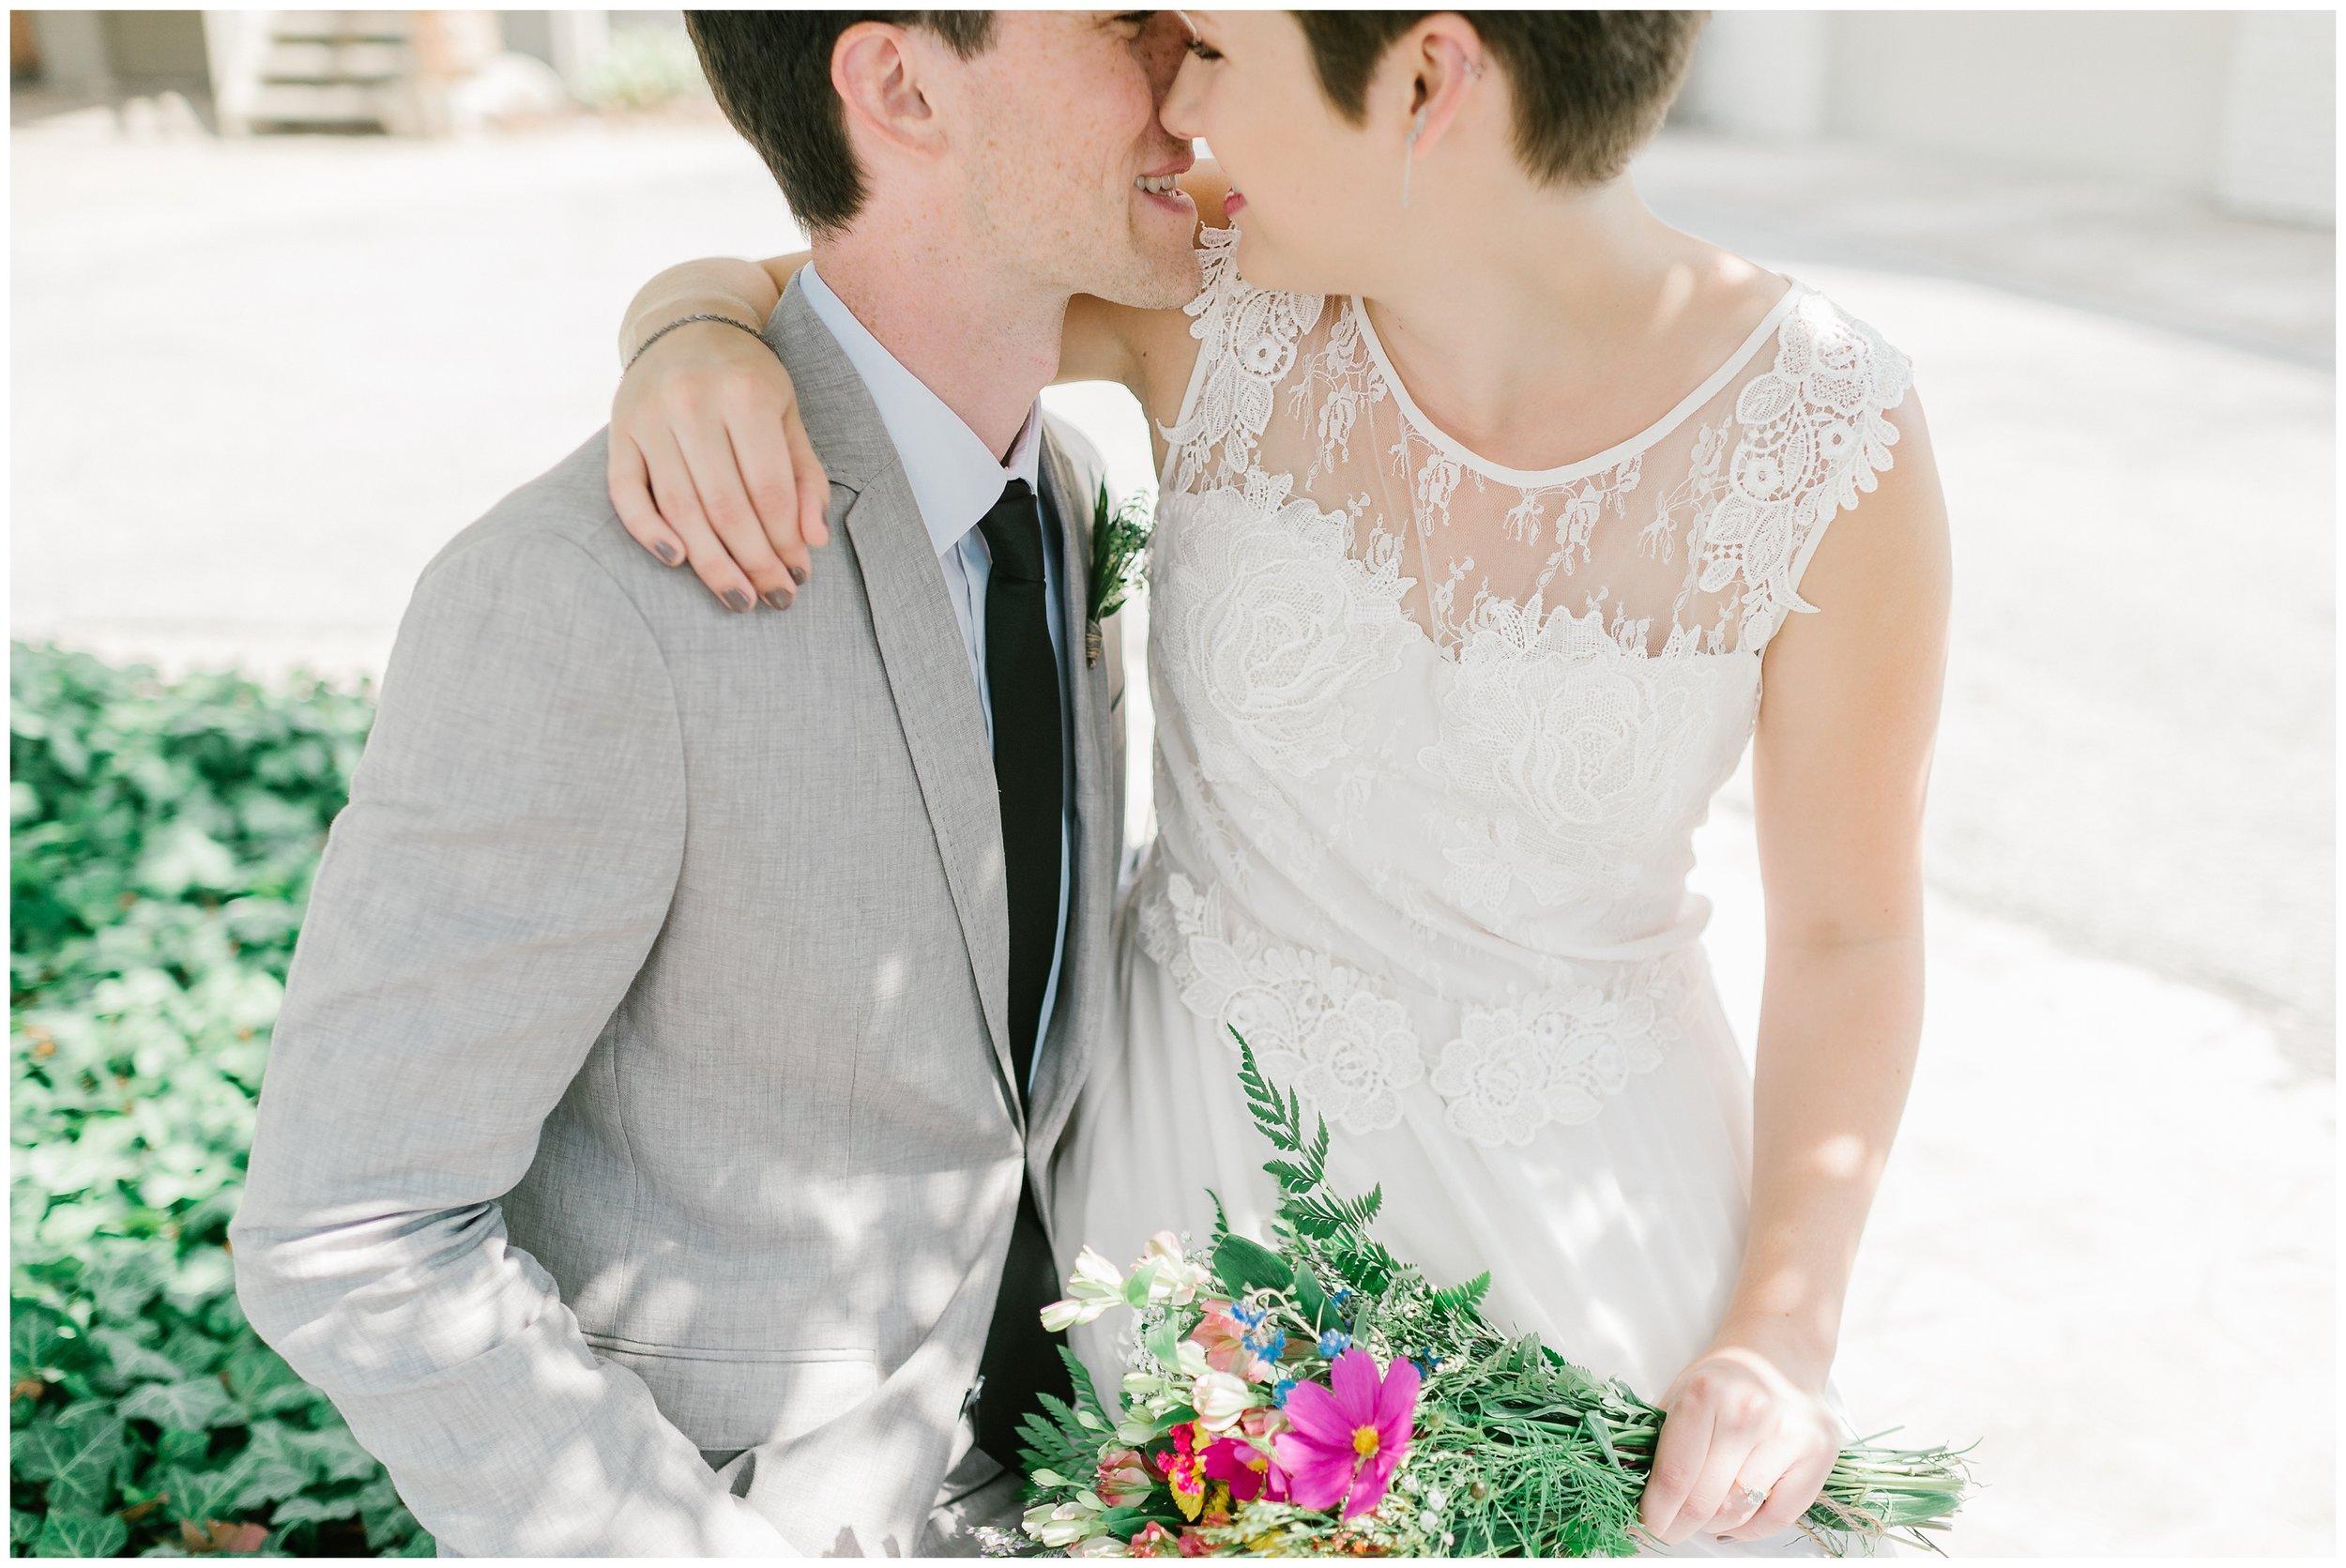 Rebecca_Shehorn_Photography_Indianapolis_Wedding_Photographer_7235.jpg